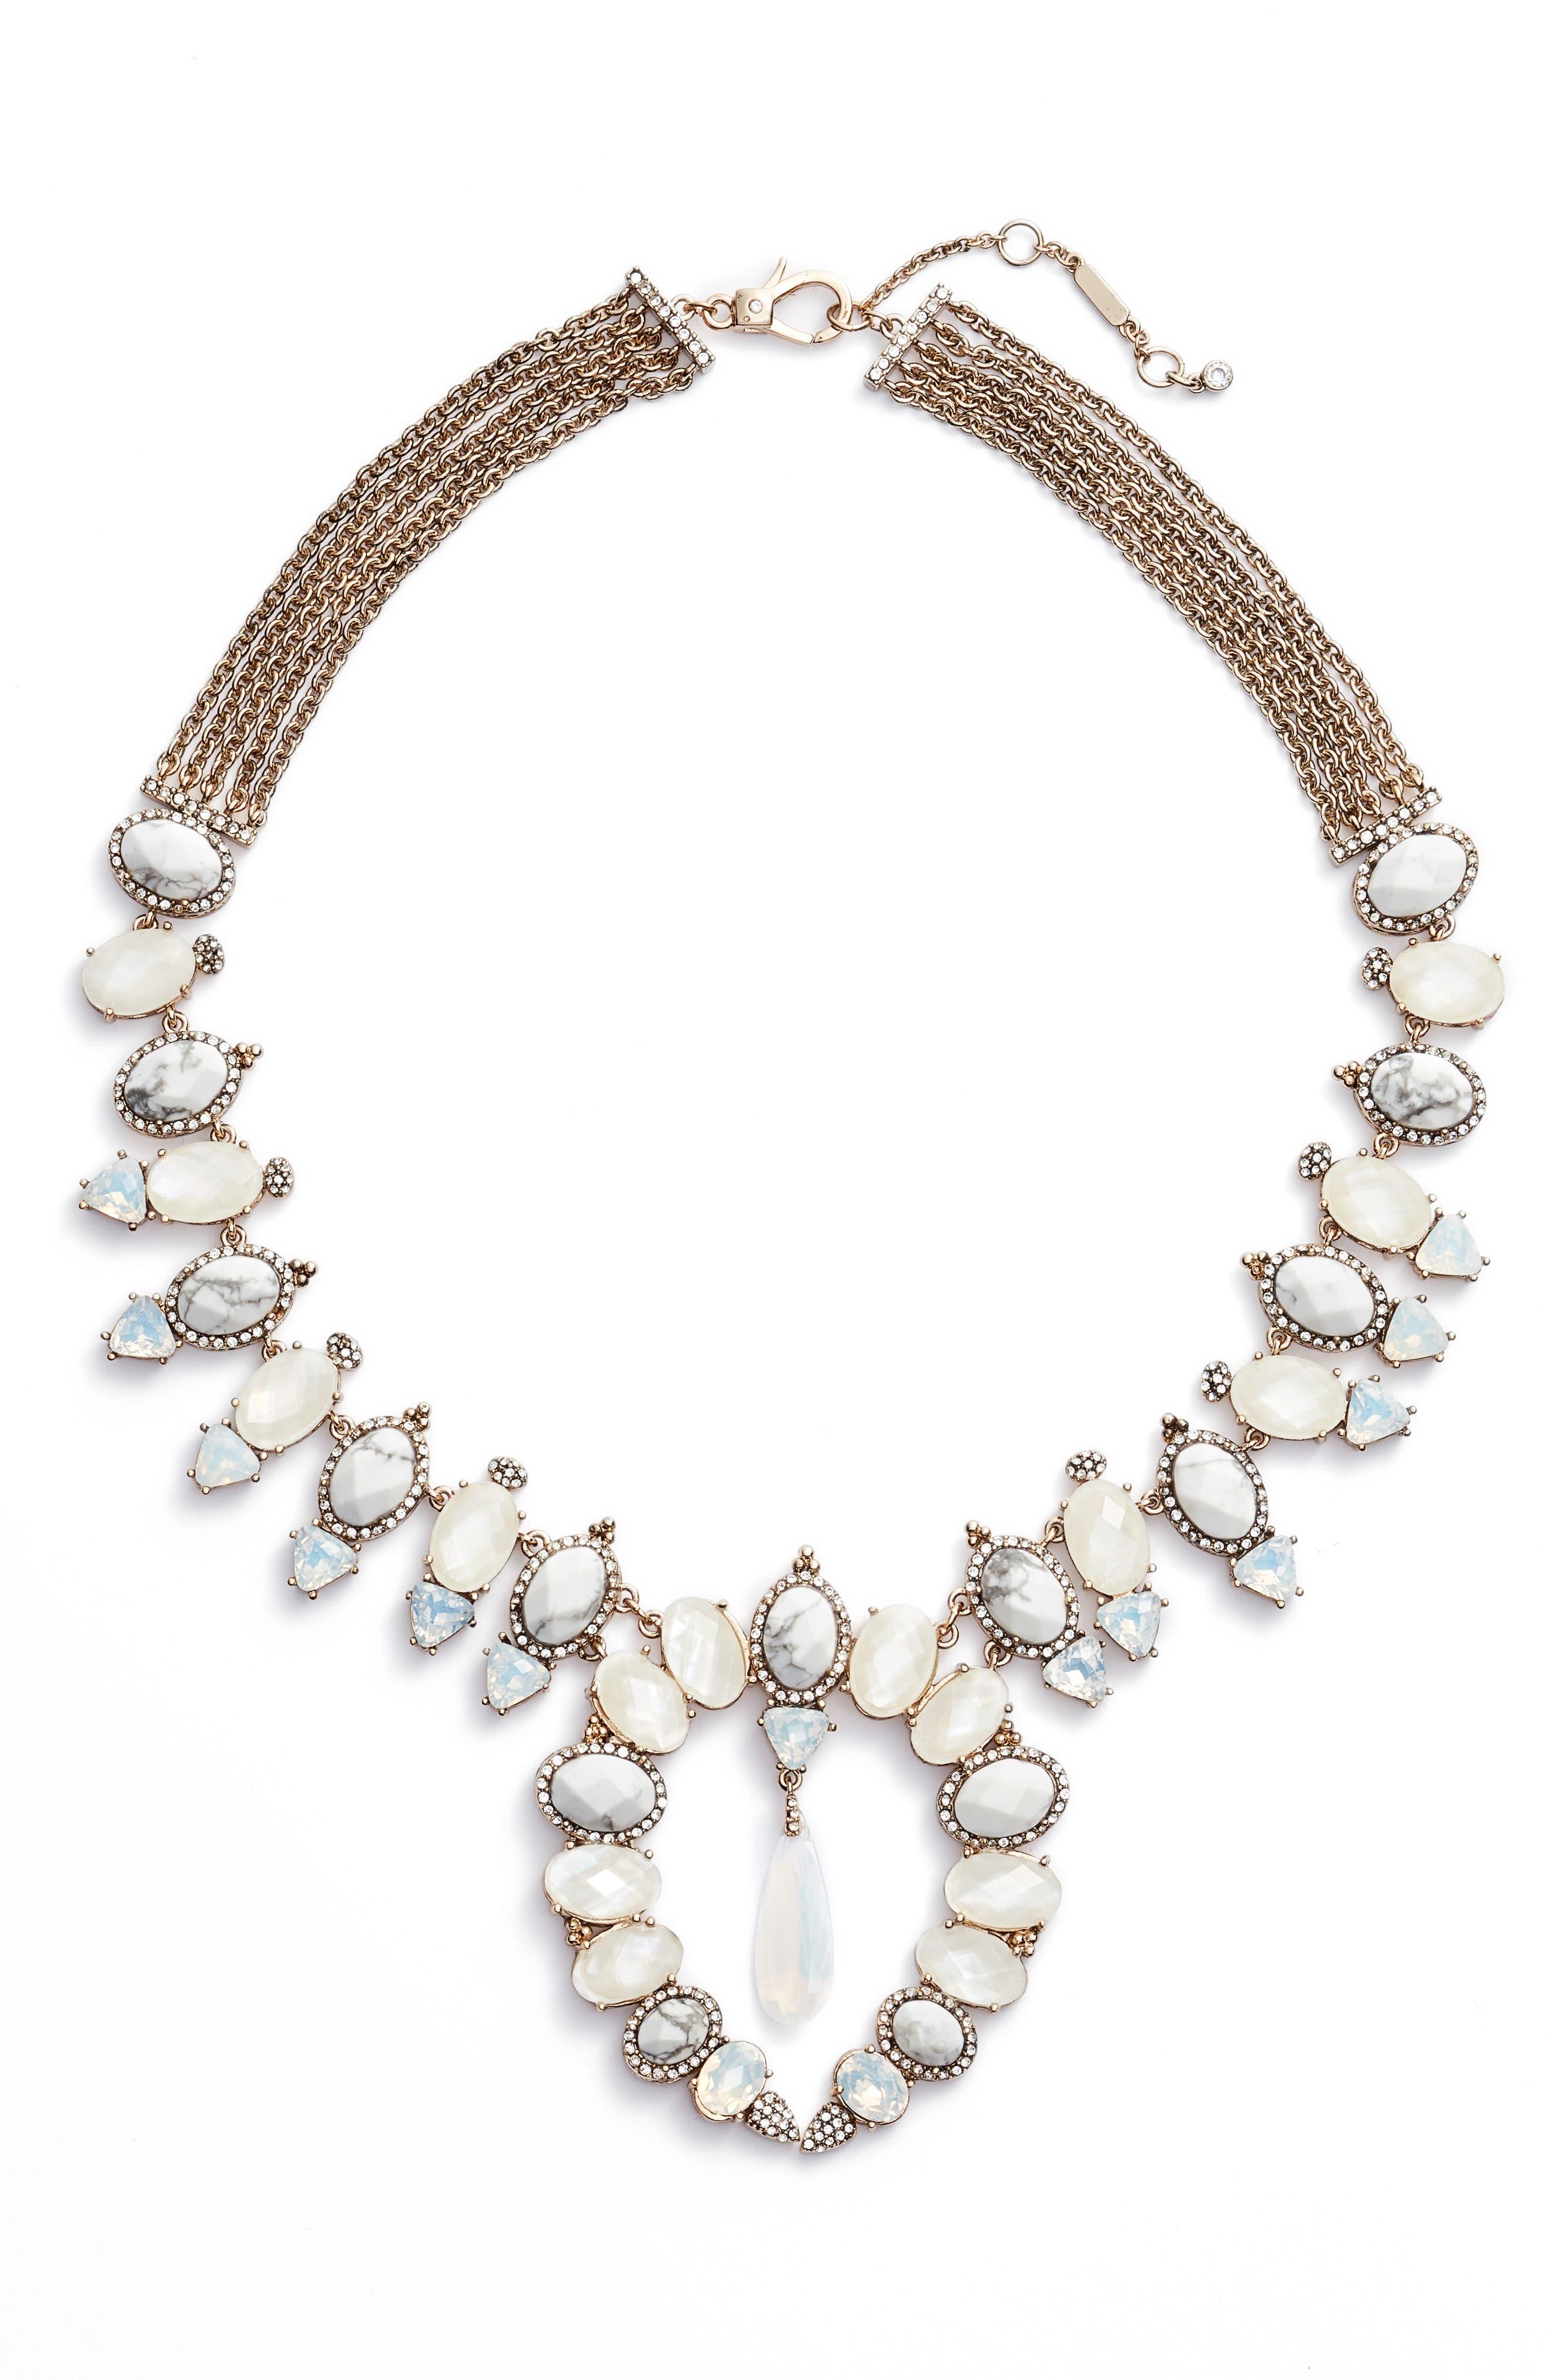 Main Image - Jenny Packham Wanderlust Collar Necklace